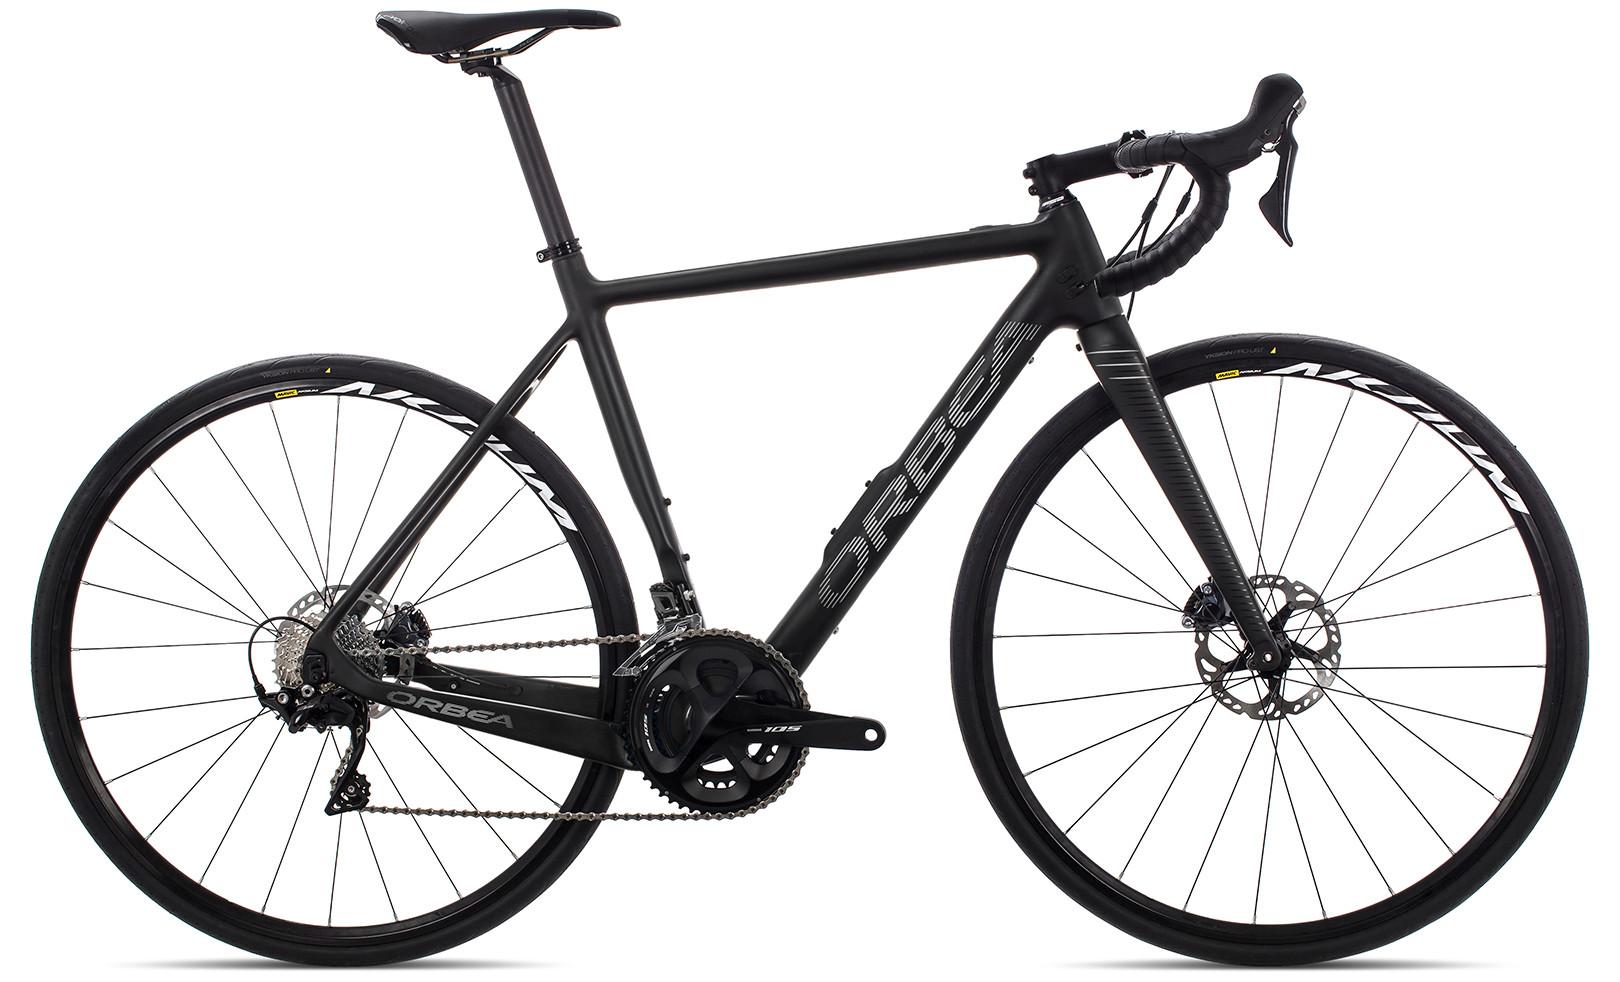 c4064287457 Orbea Gain M30 Electric Road Bike 2019 Black/Grey £3,399.00